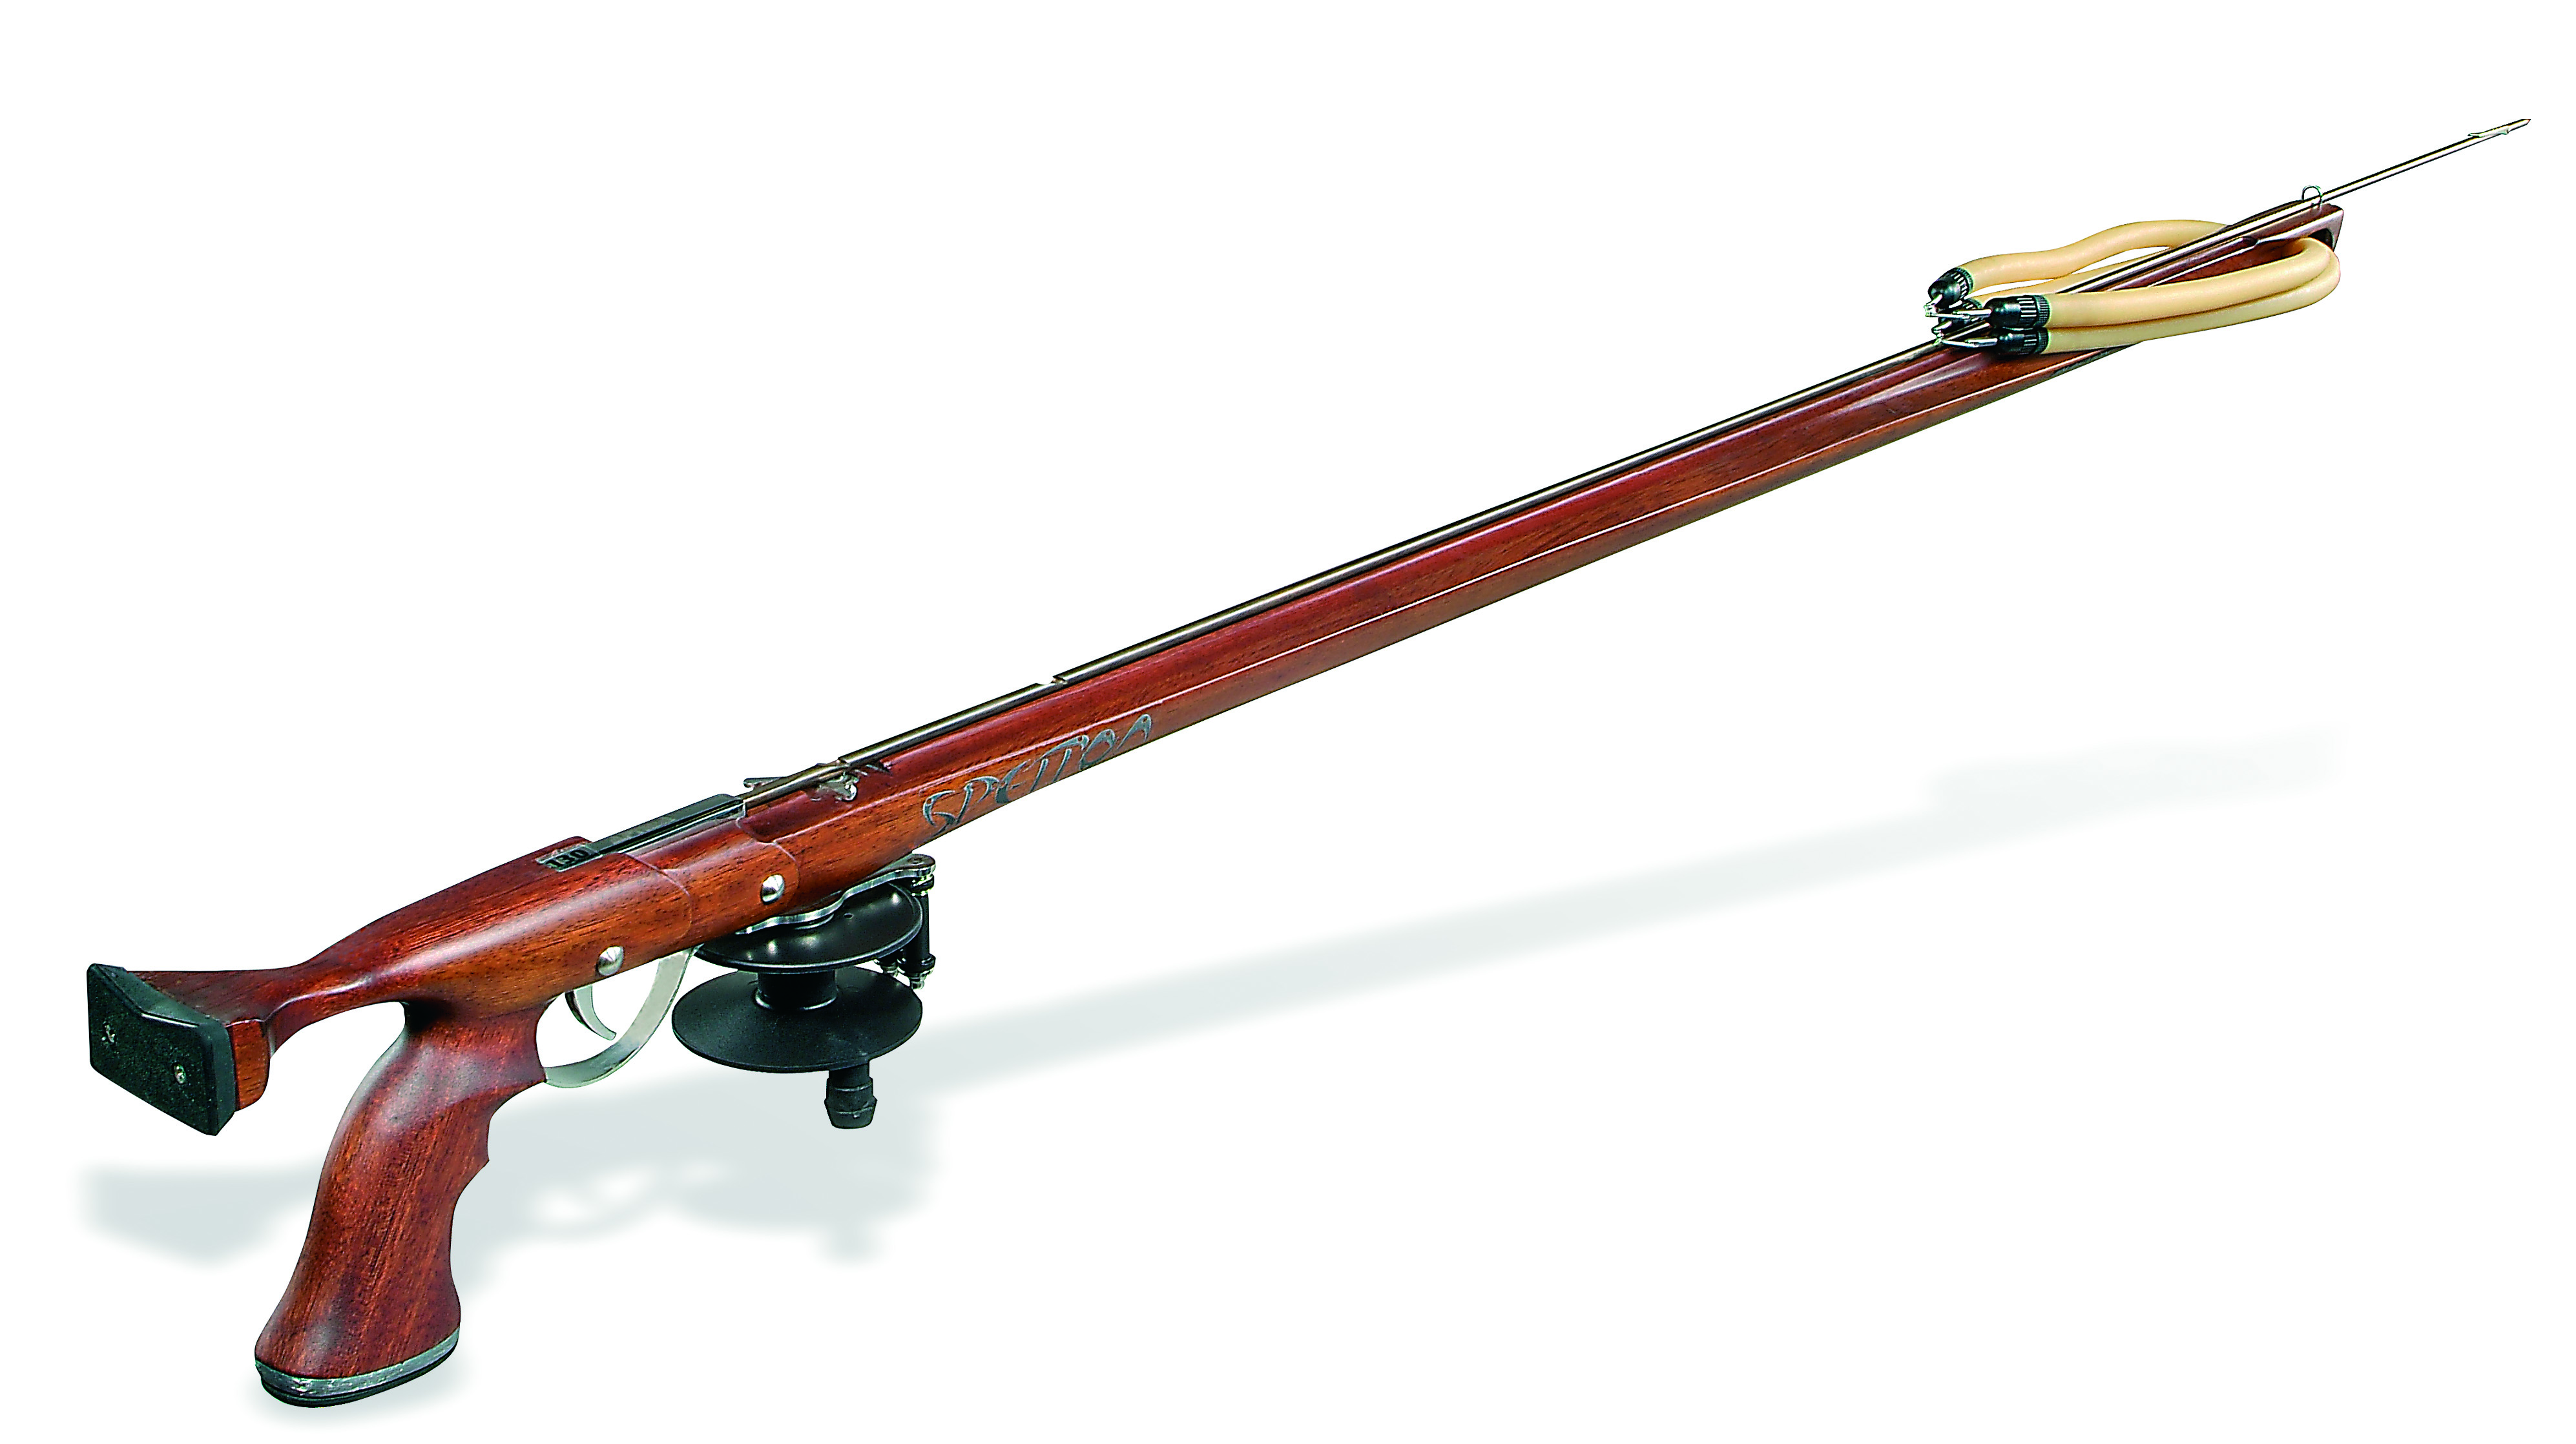 p-1466-spearfishing-speargun-cubera-wood-spetton.jpg